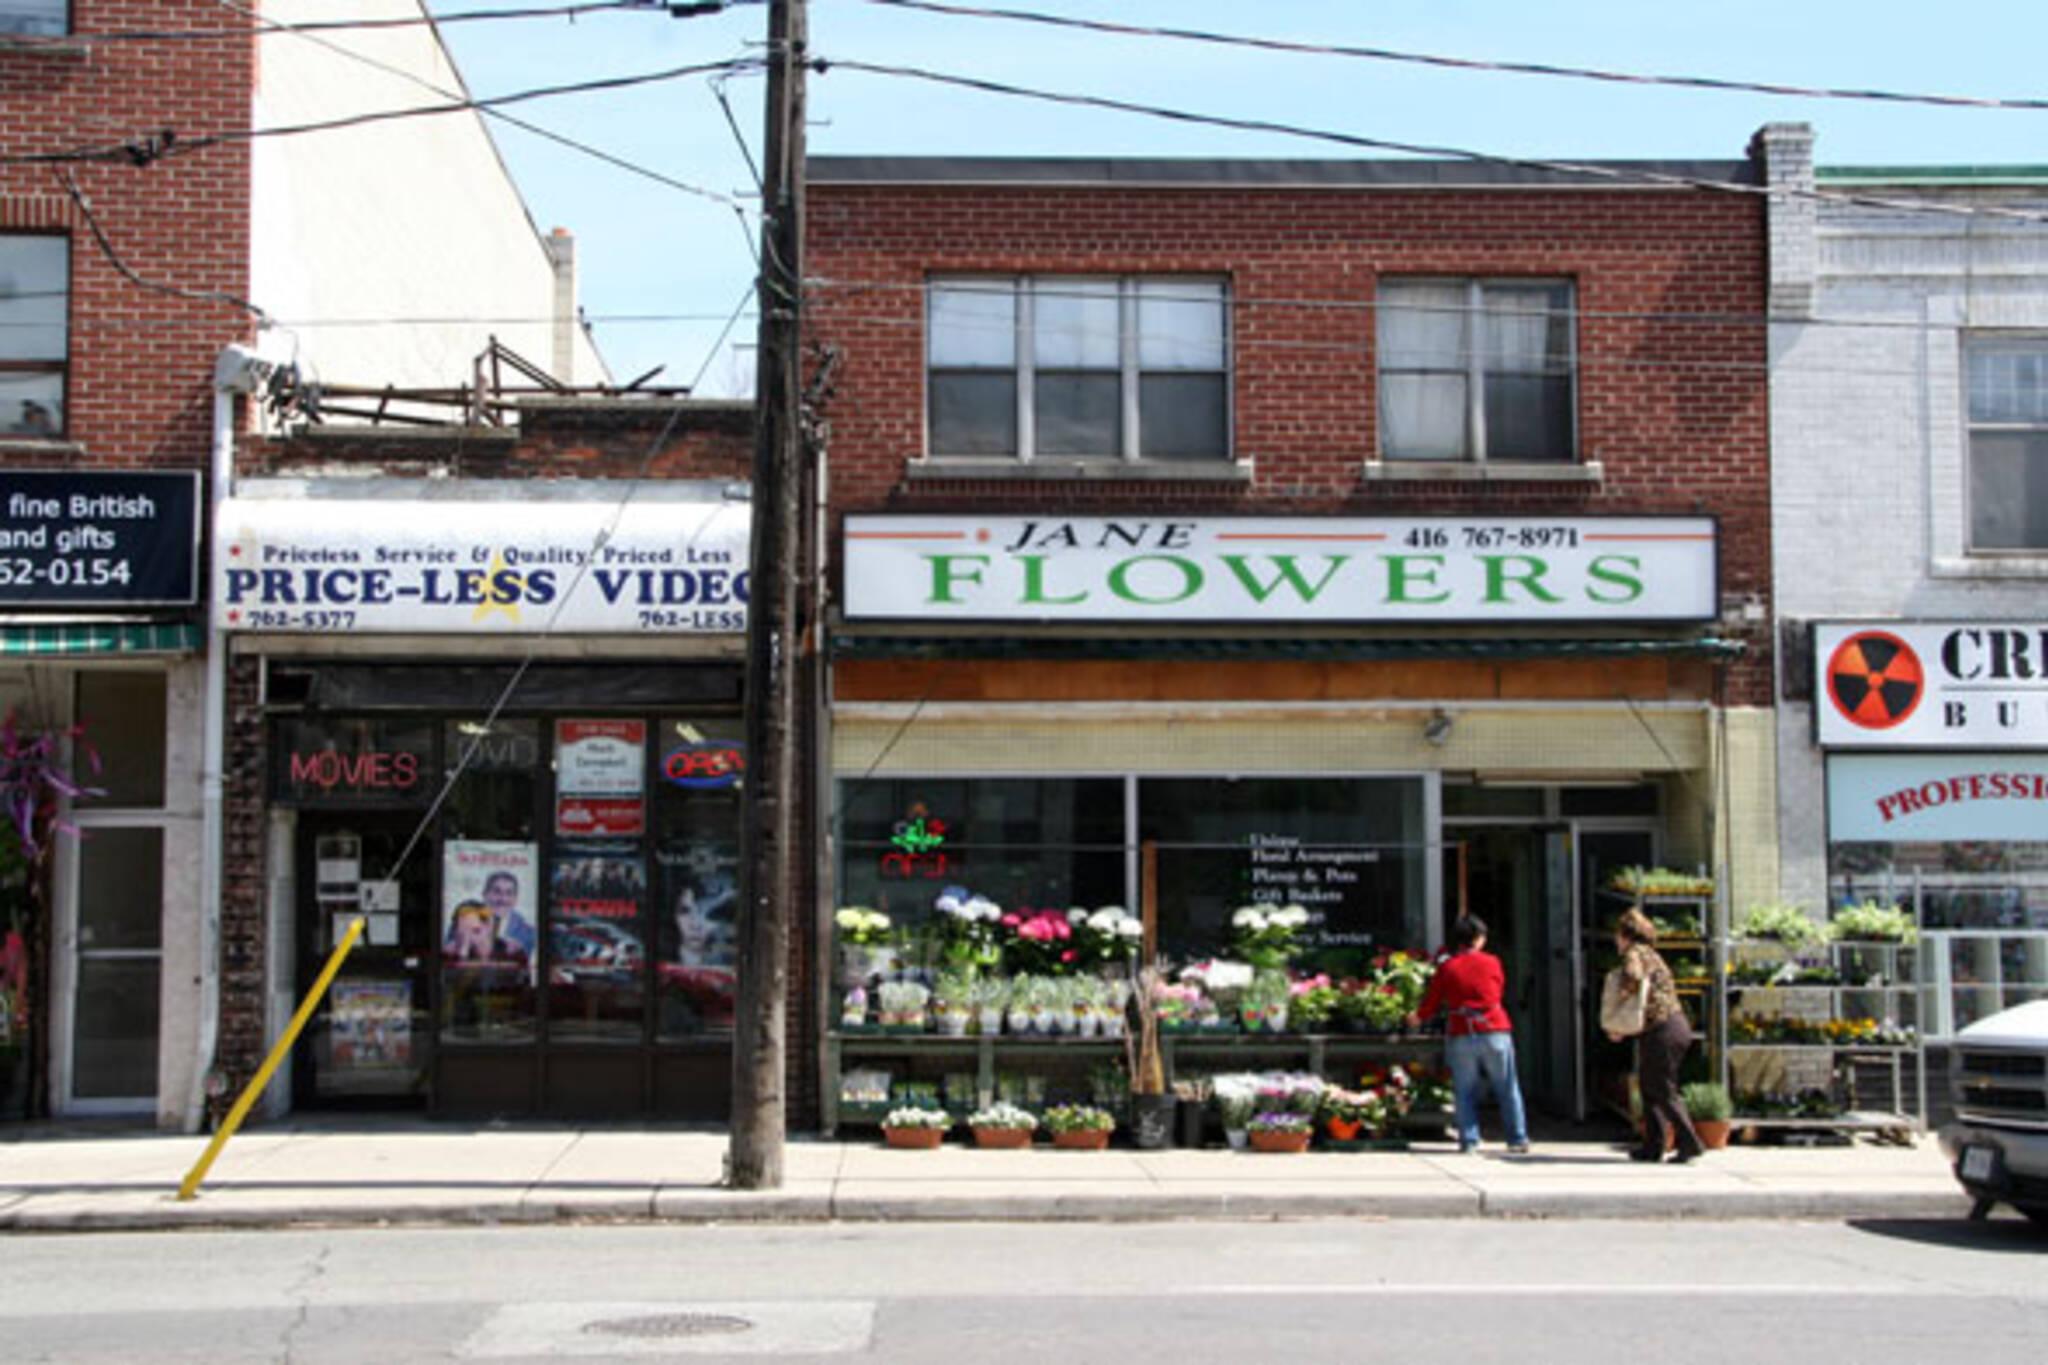 Jane Flowers Toronto